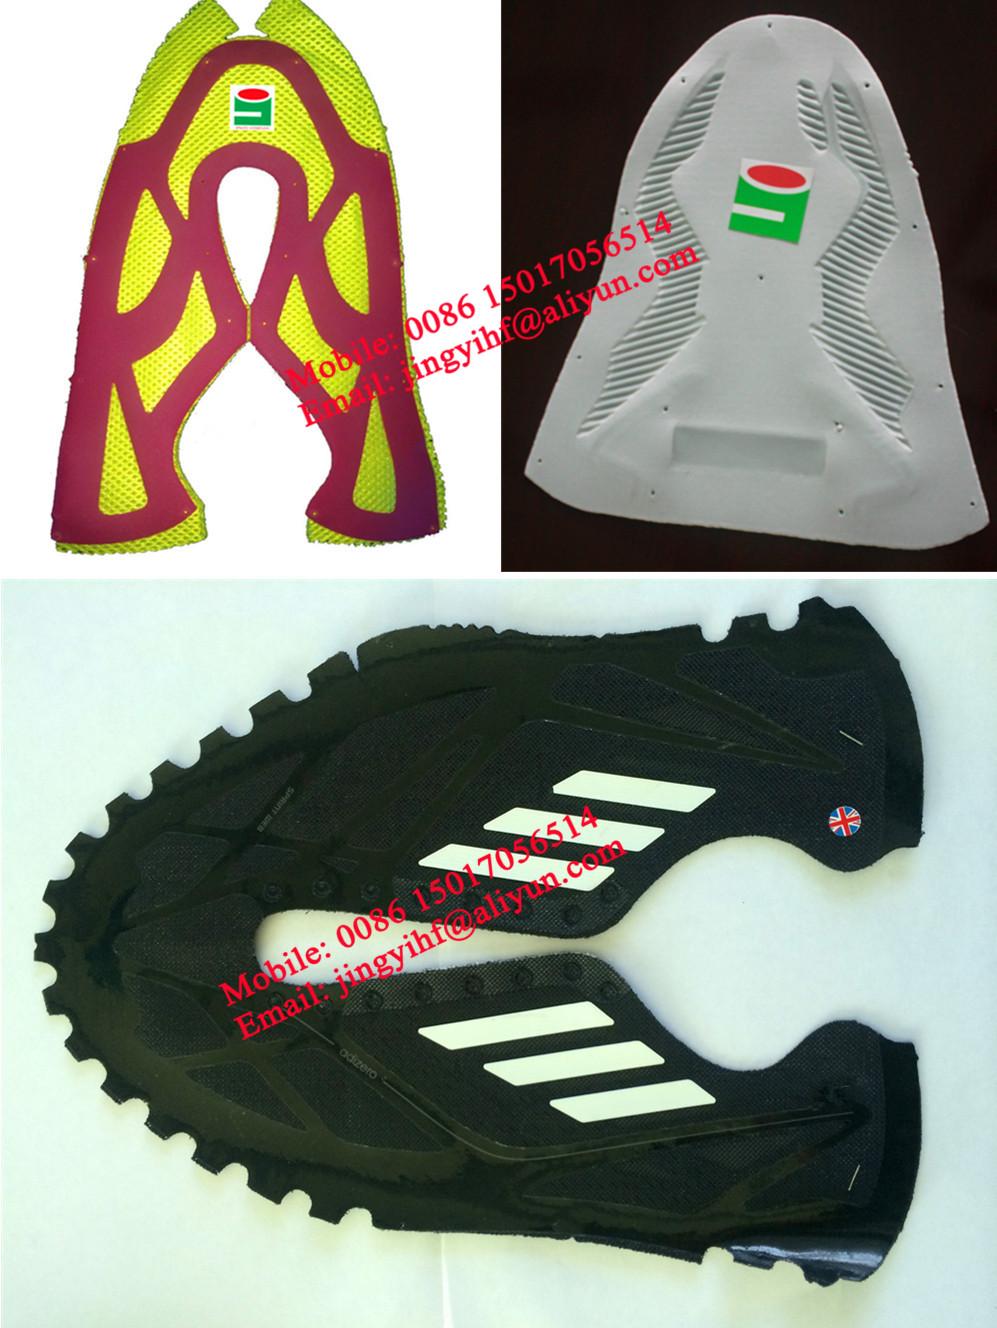 JingYi Brand Hot-Sale High Quality Automatic Hydraulic Shoe Cutting Press Machine(JY-QHZD-RY)Shoes Heat Press machine